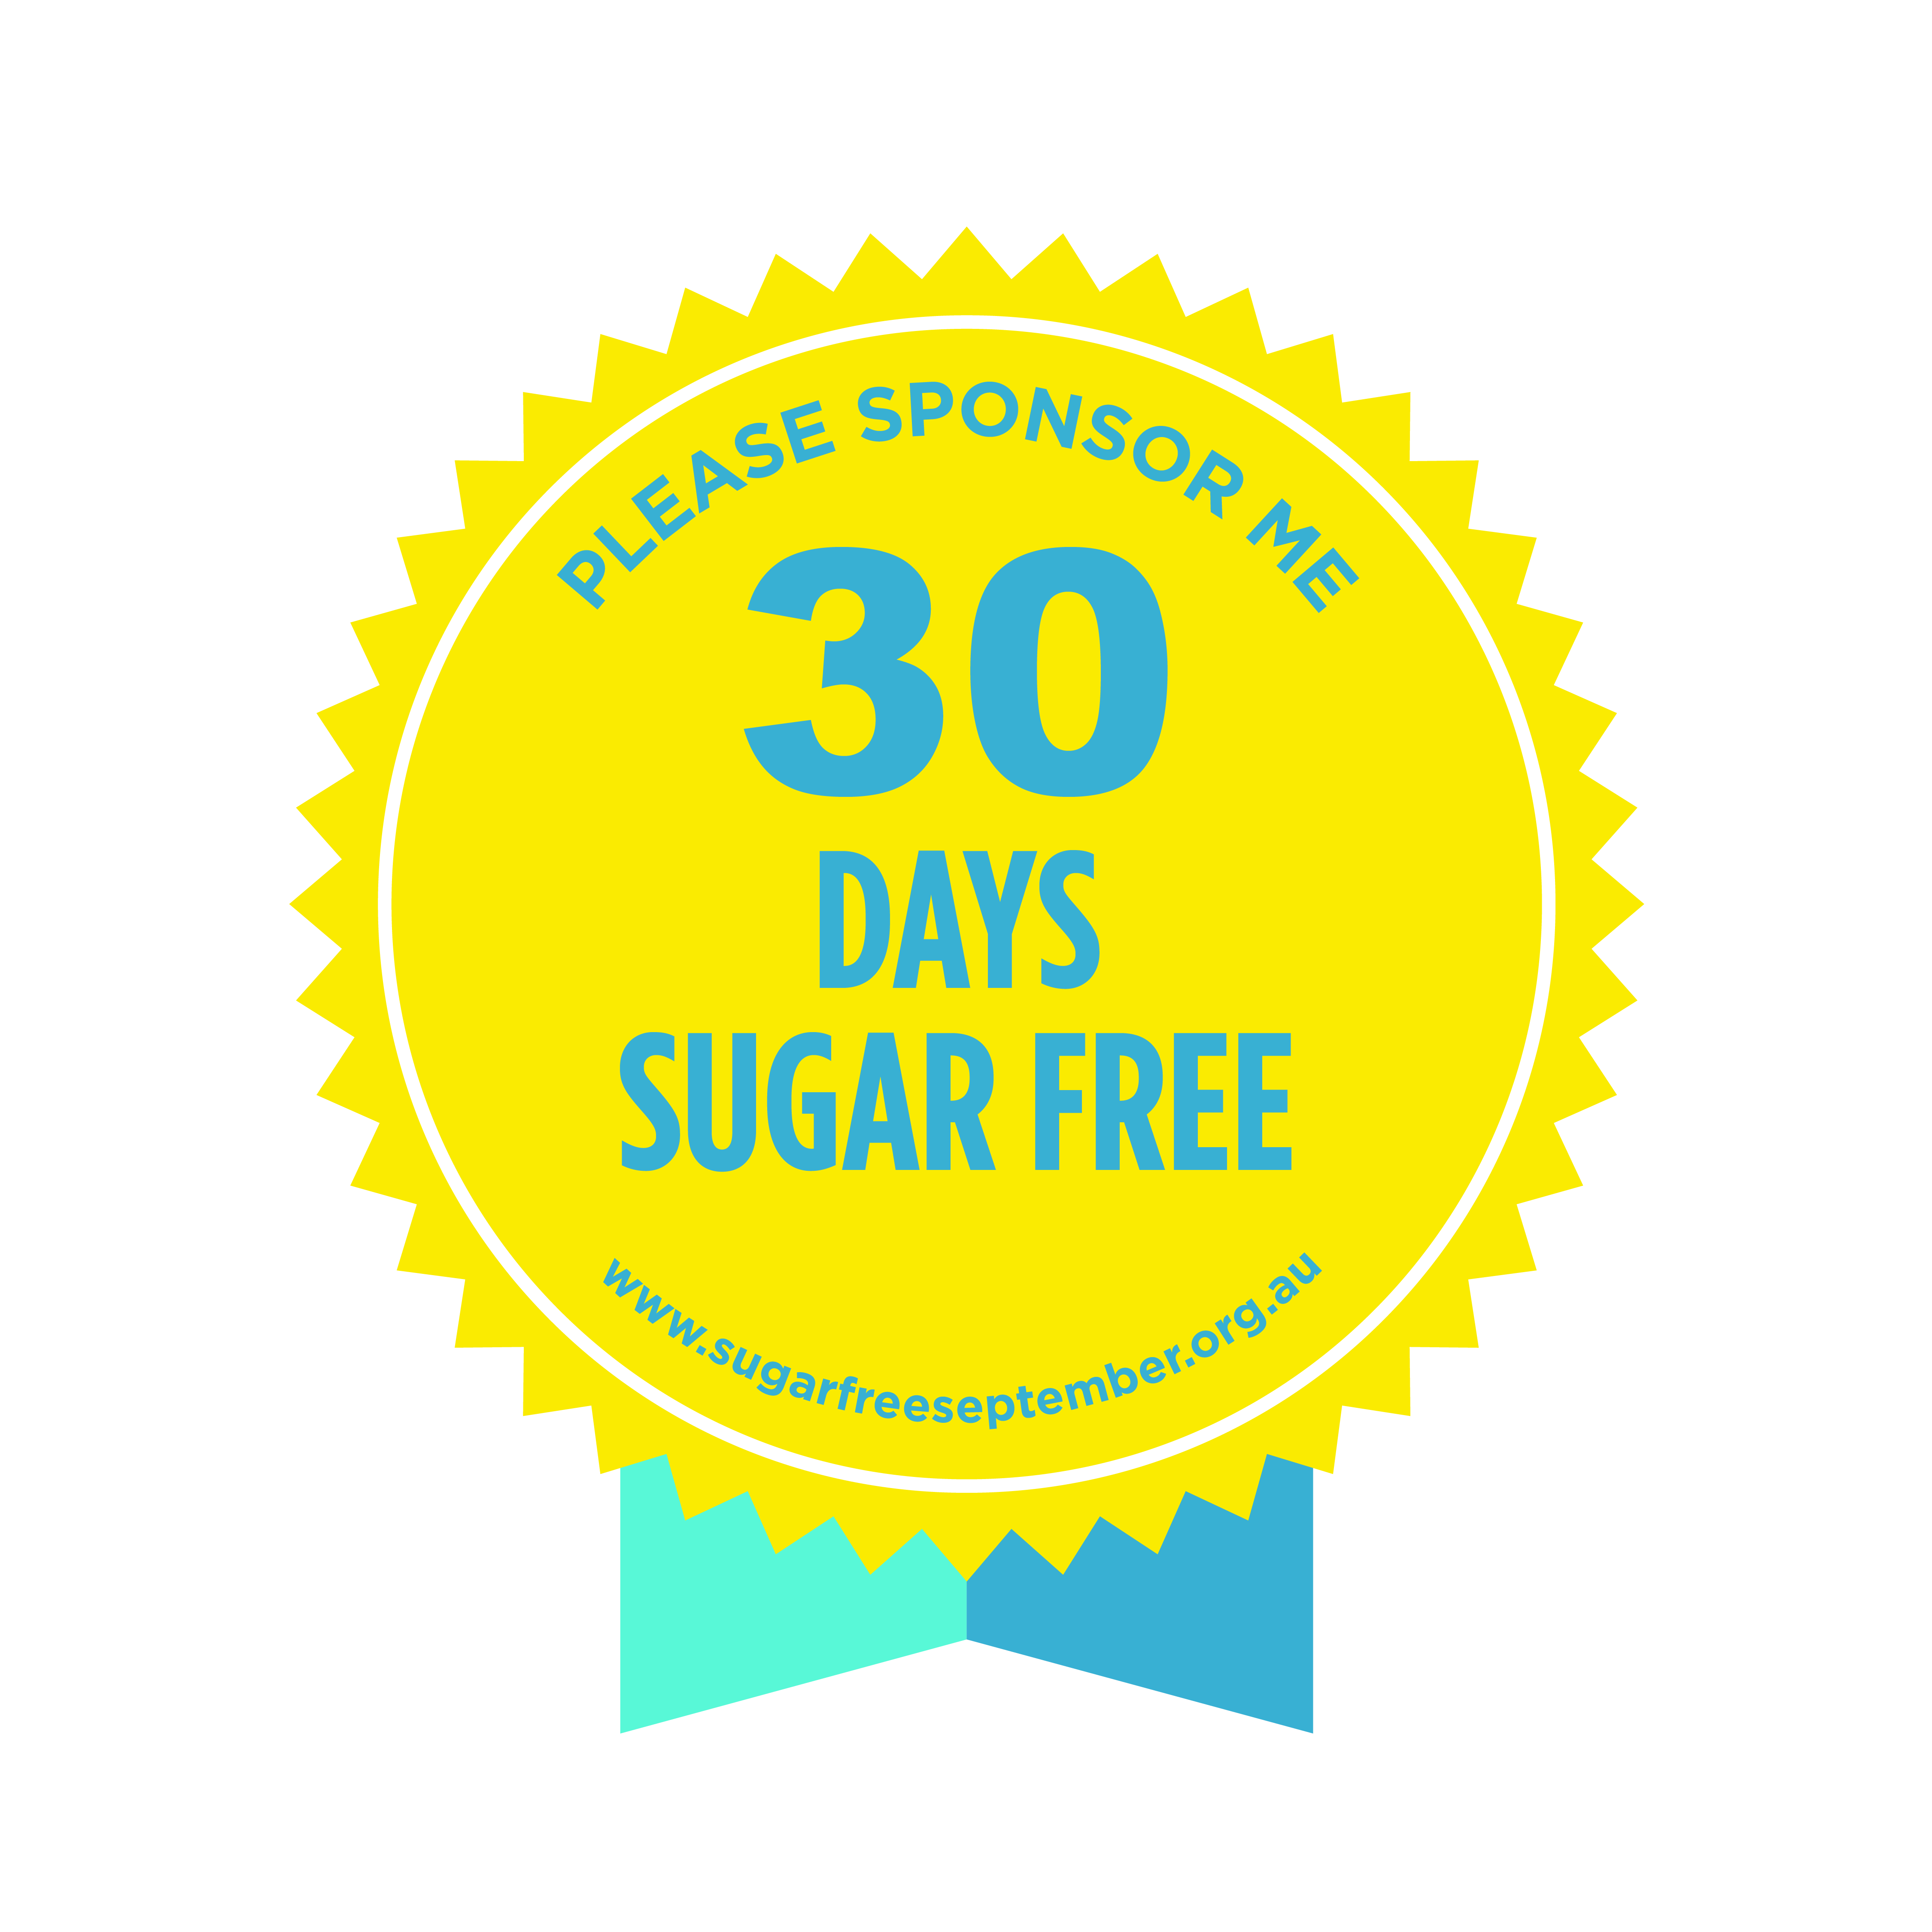 30 days sugar free badge